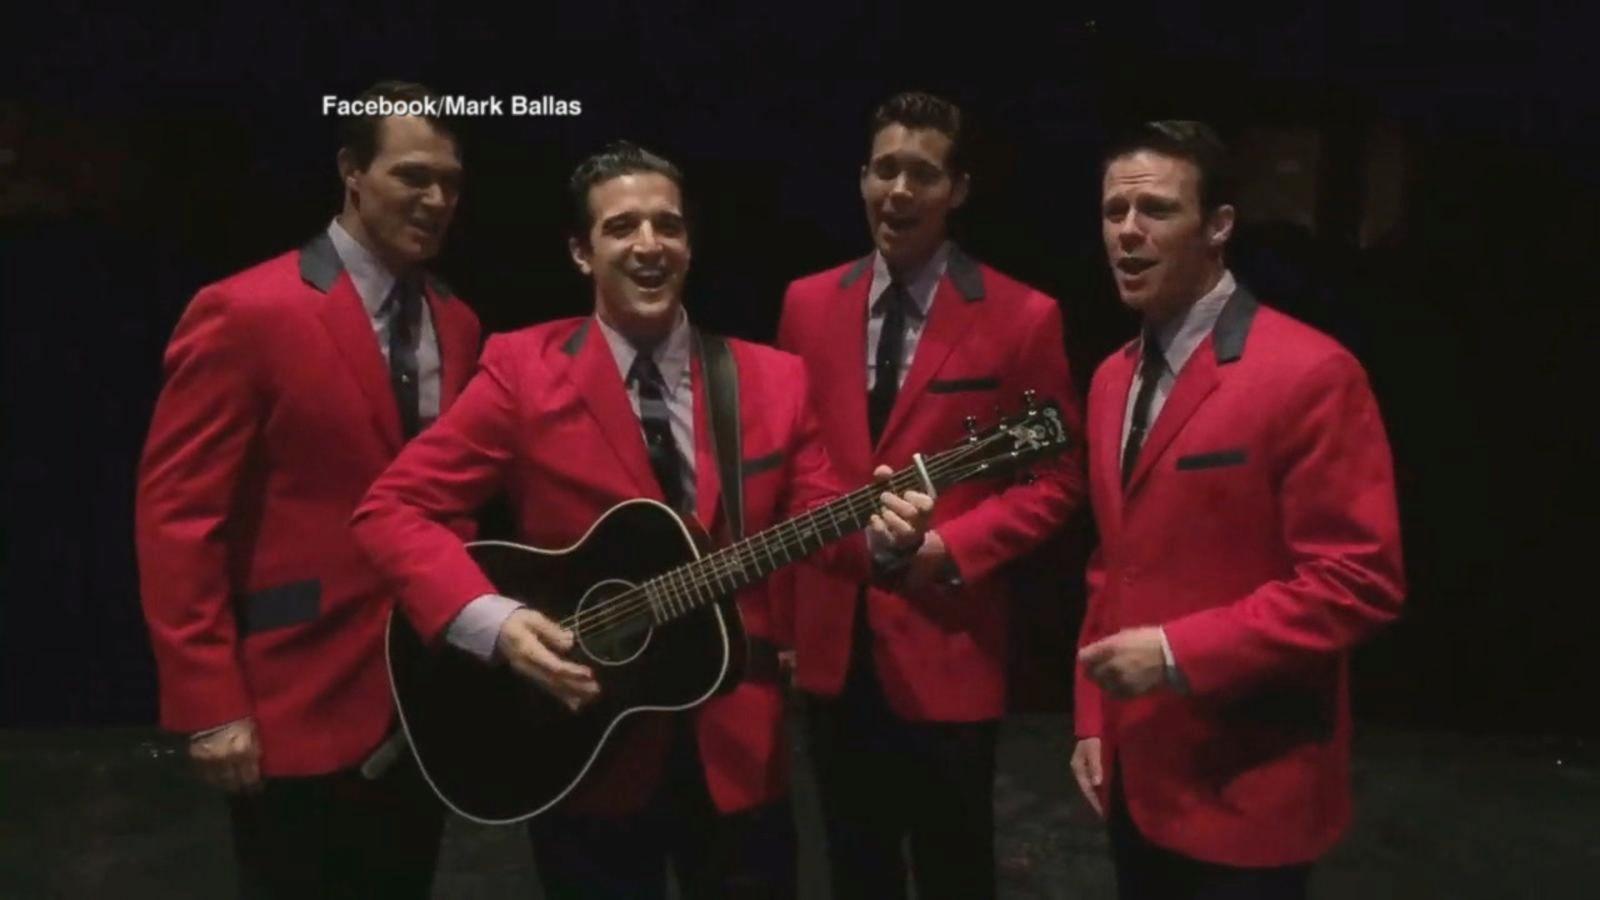 VIDEO: 'DWTS' Mark Ballas Joins Cast of 'Jersey Boys' as Frankie Valli